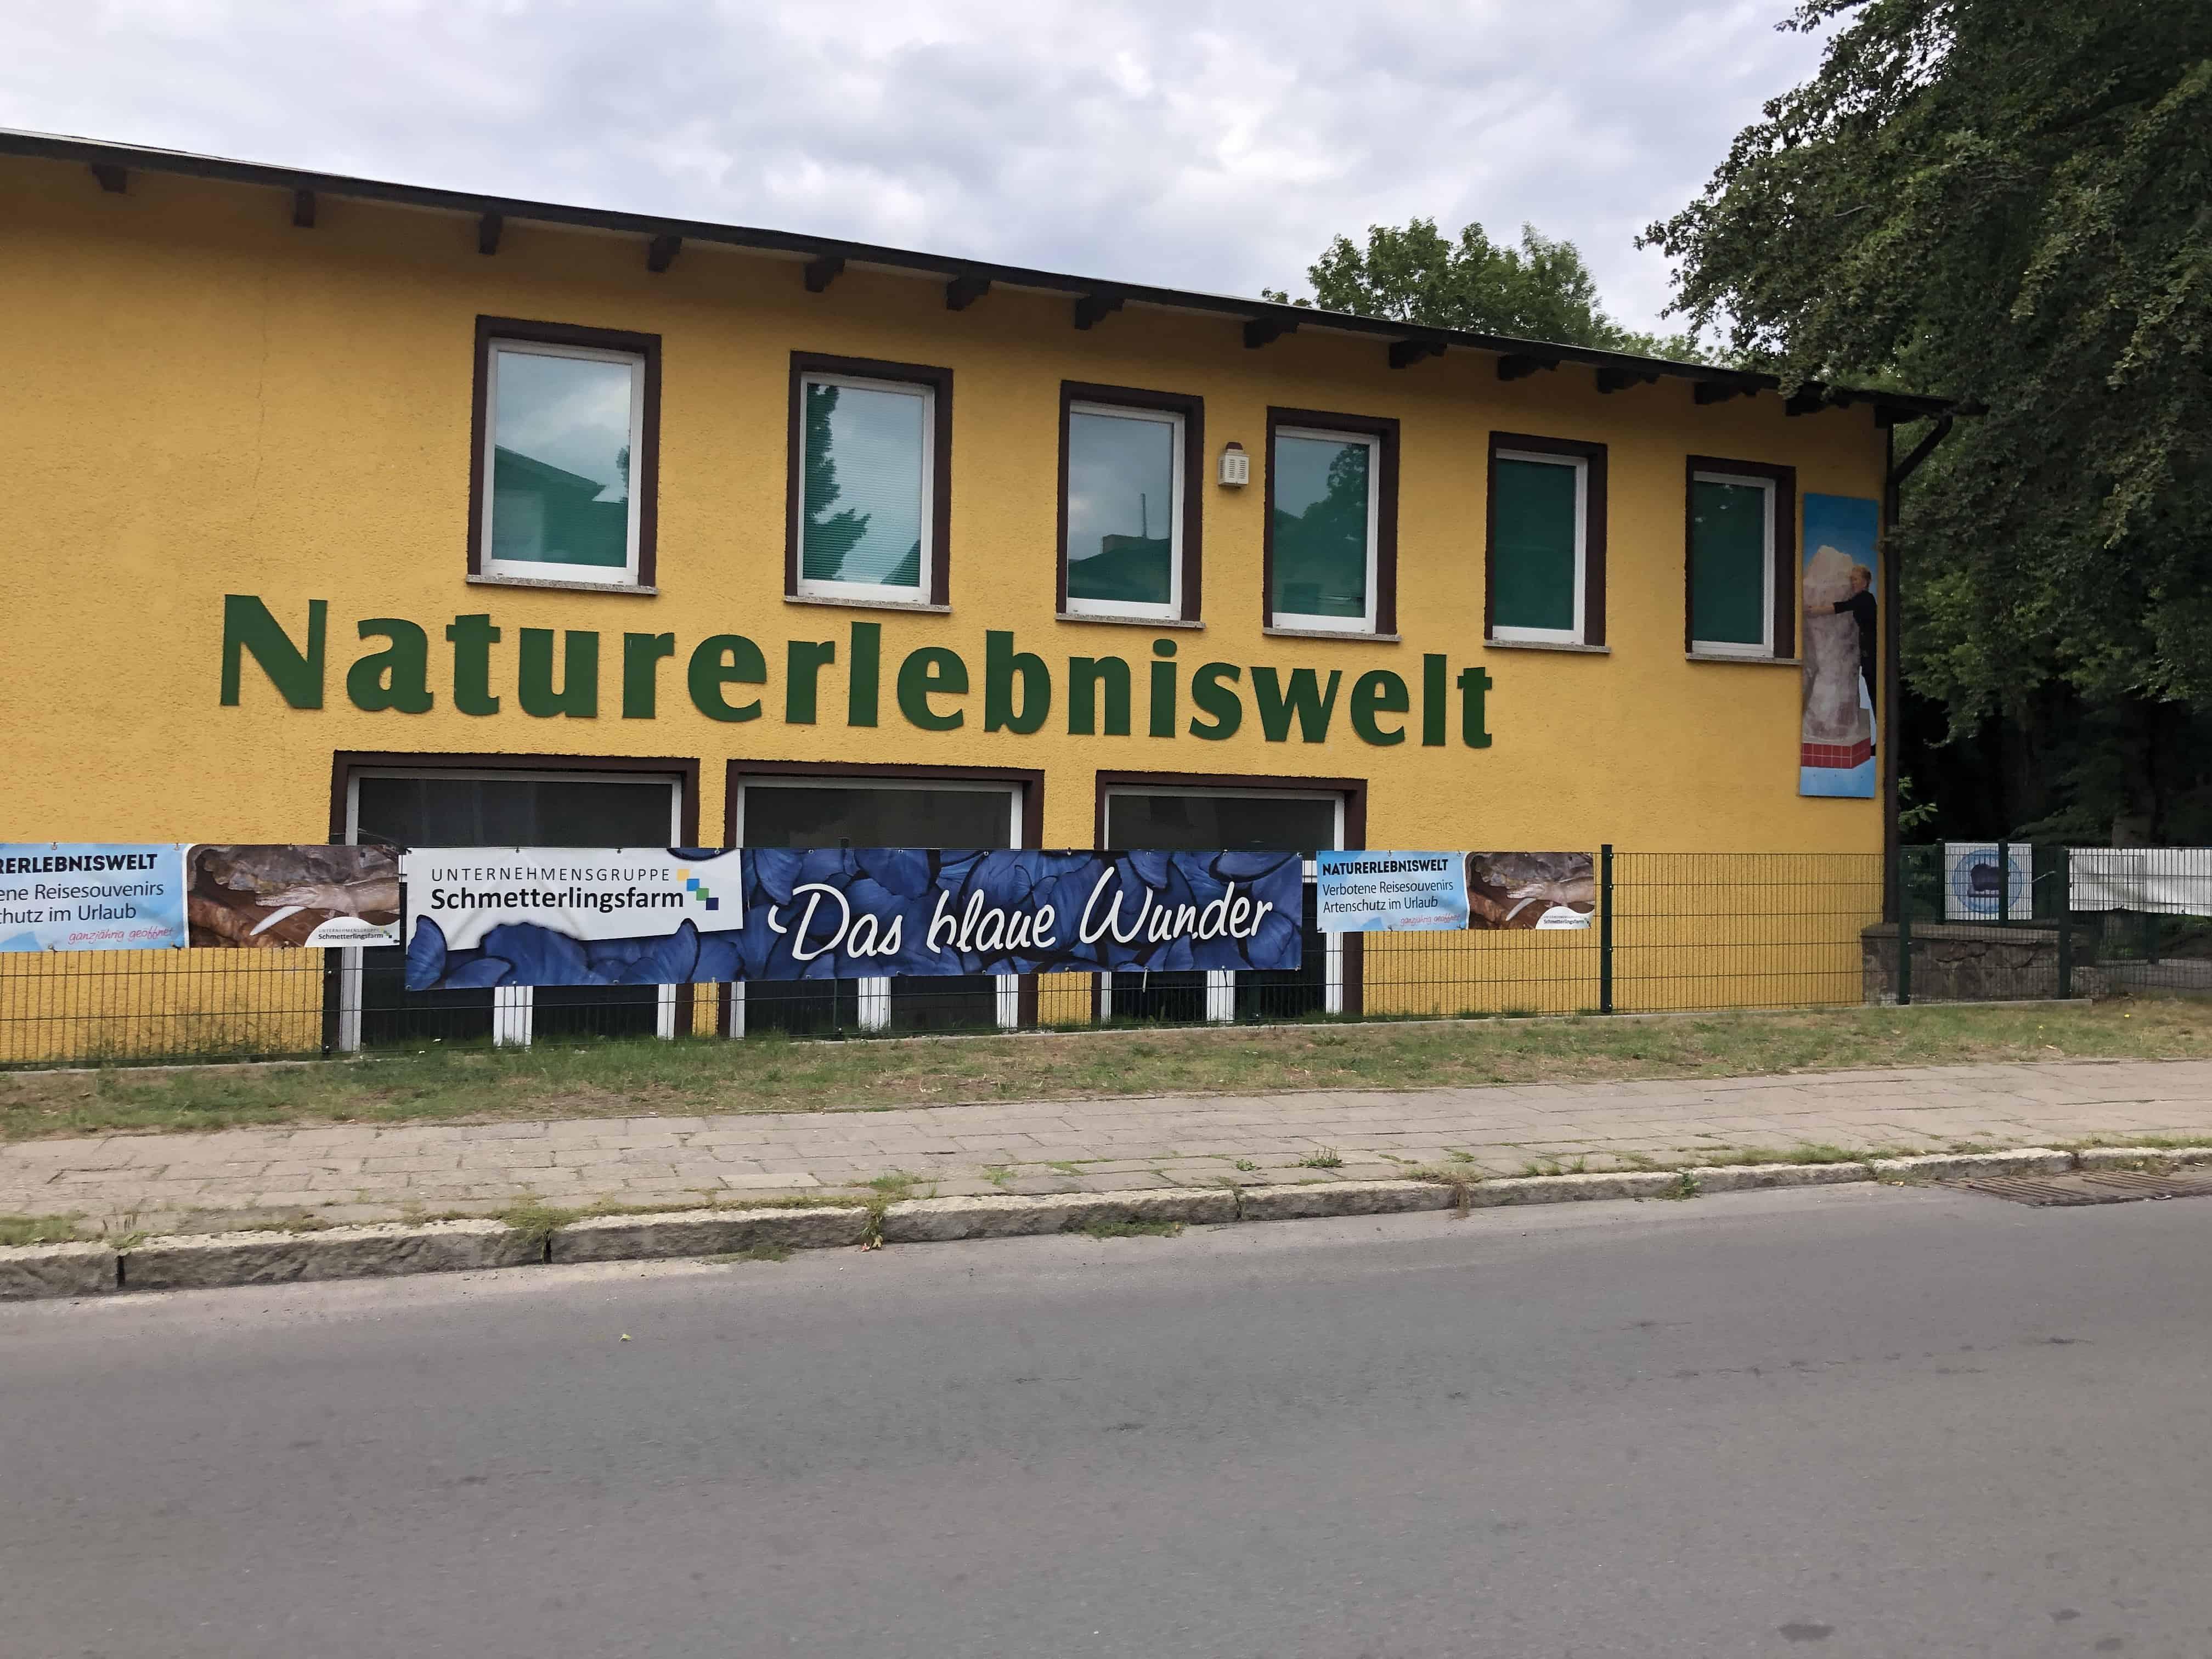 naturerlebniswelt heringsdorf